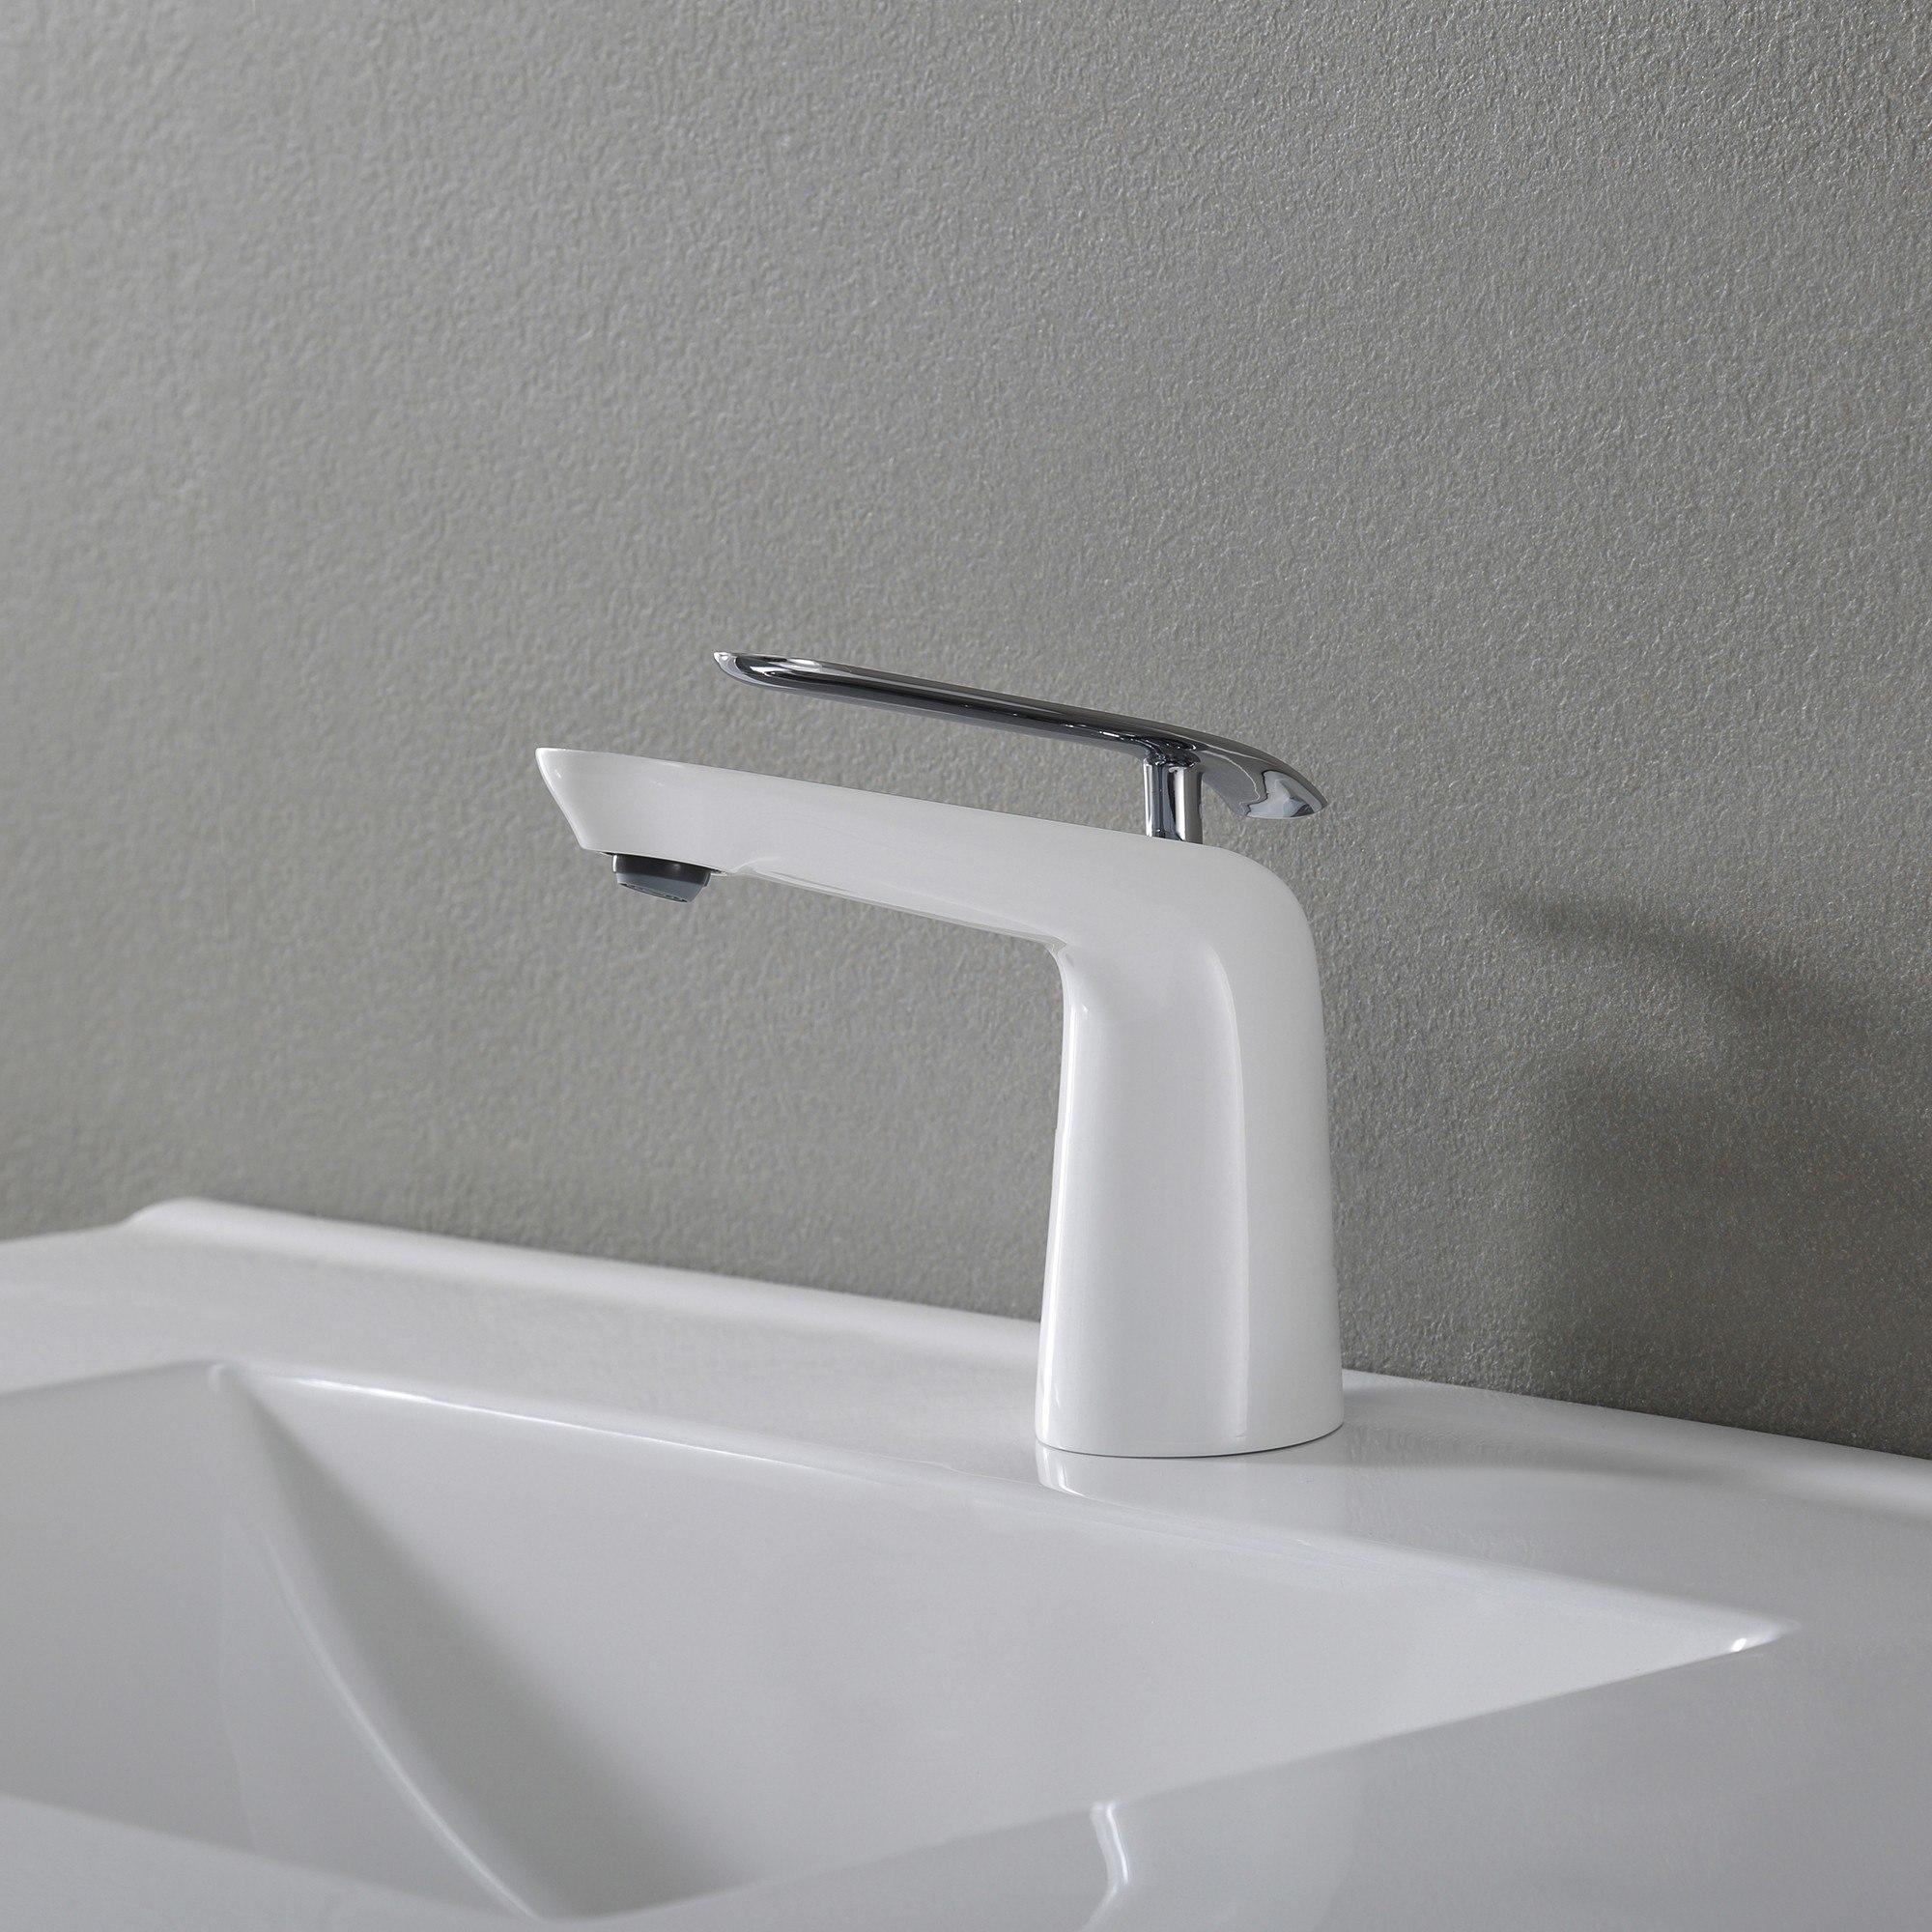 Seda Single Lever Basin Bathroom Faucet Chrome-White